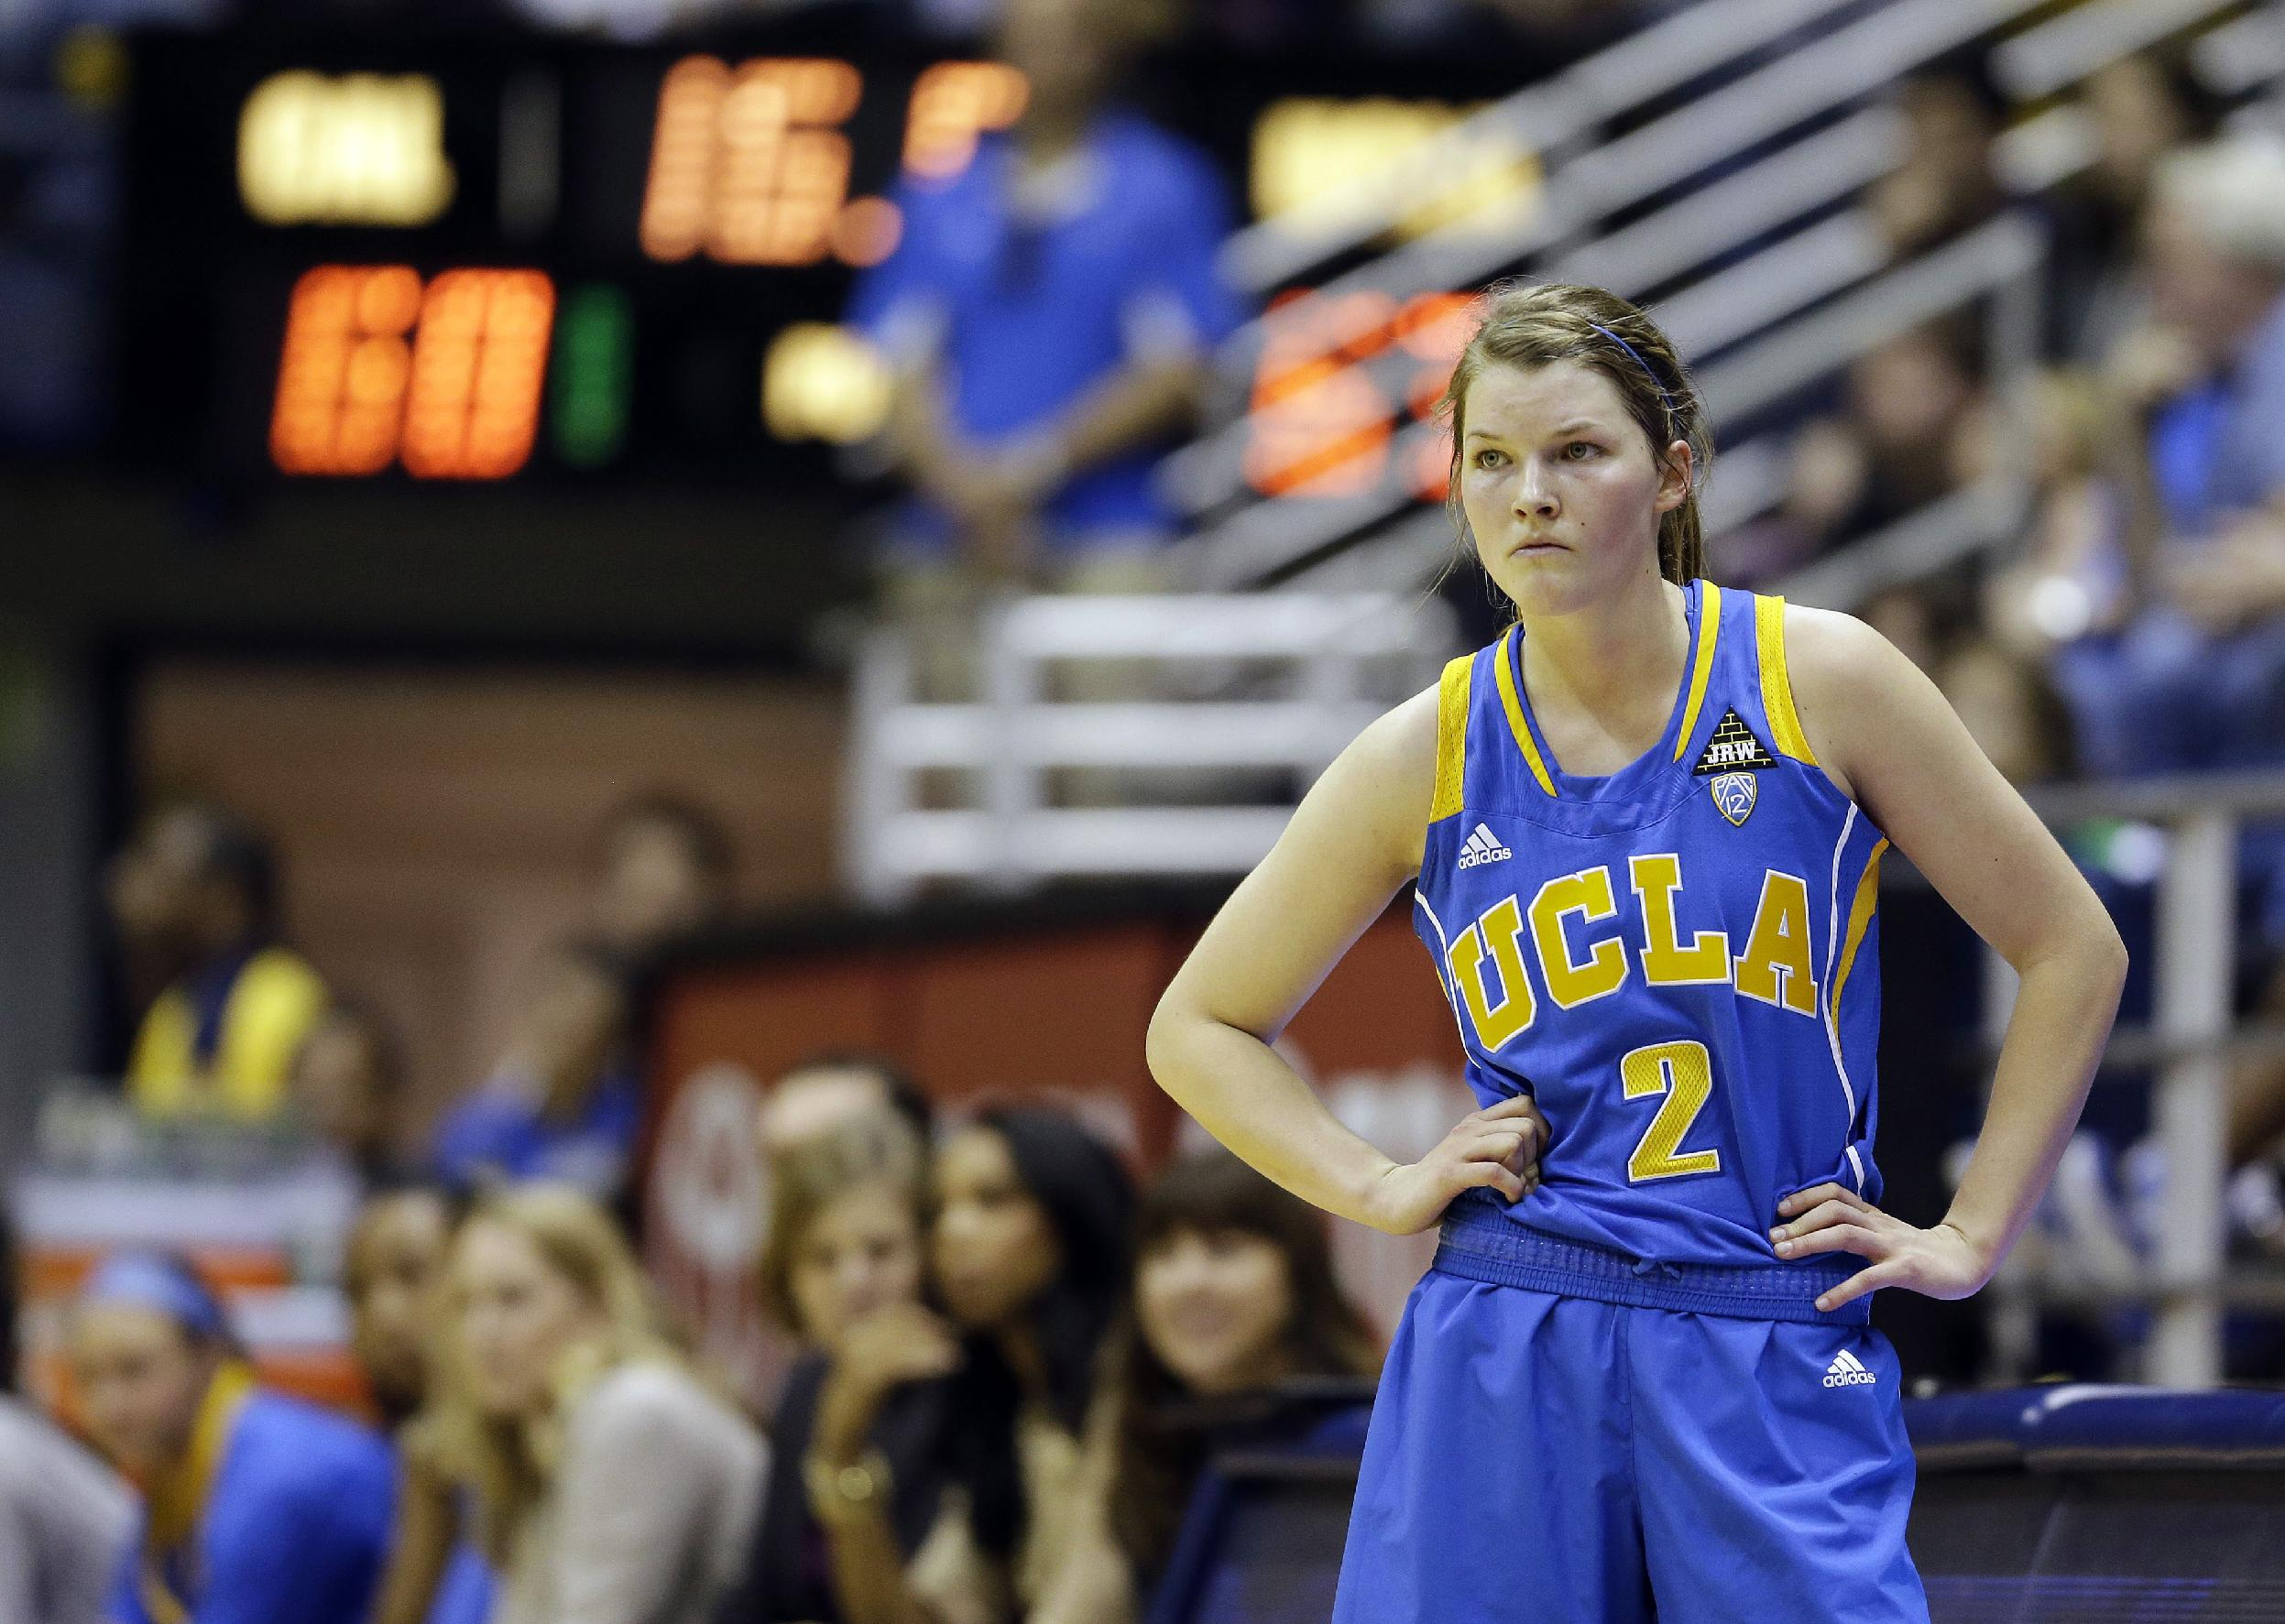 UCLA's Kari Korver to miss basketball season